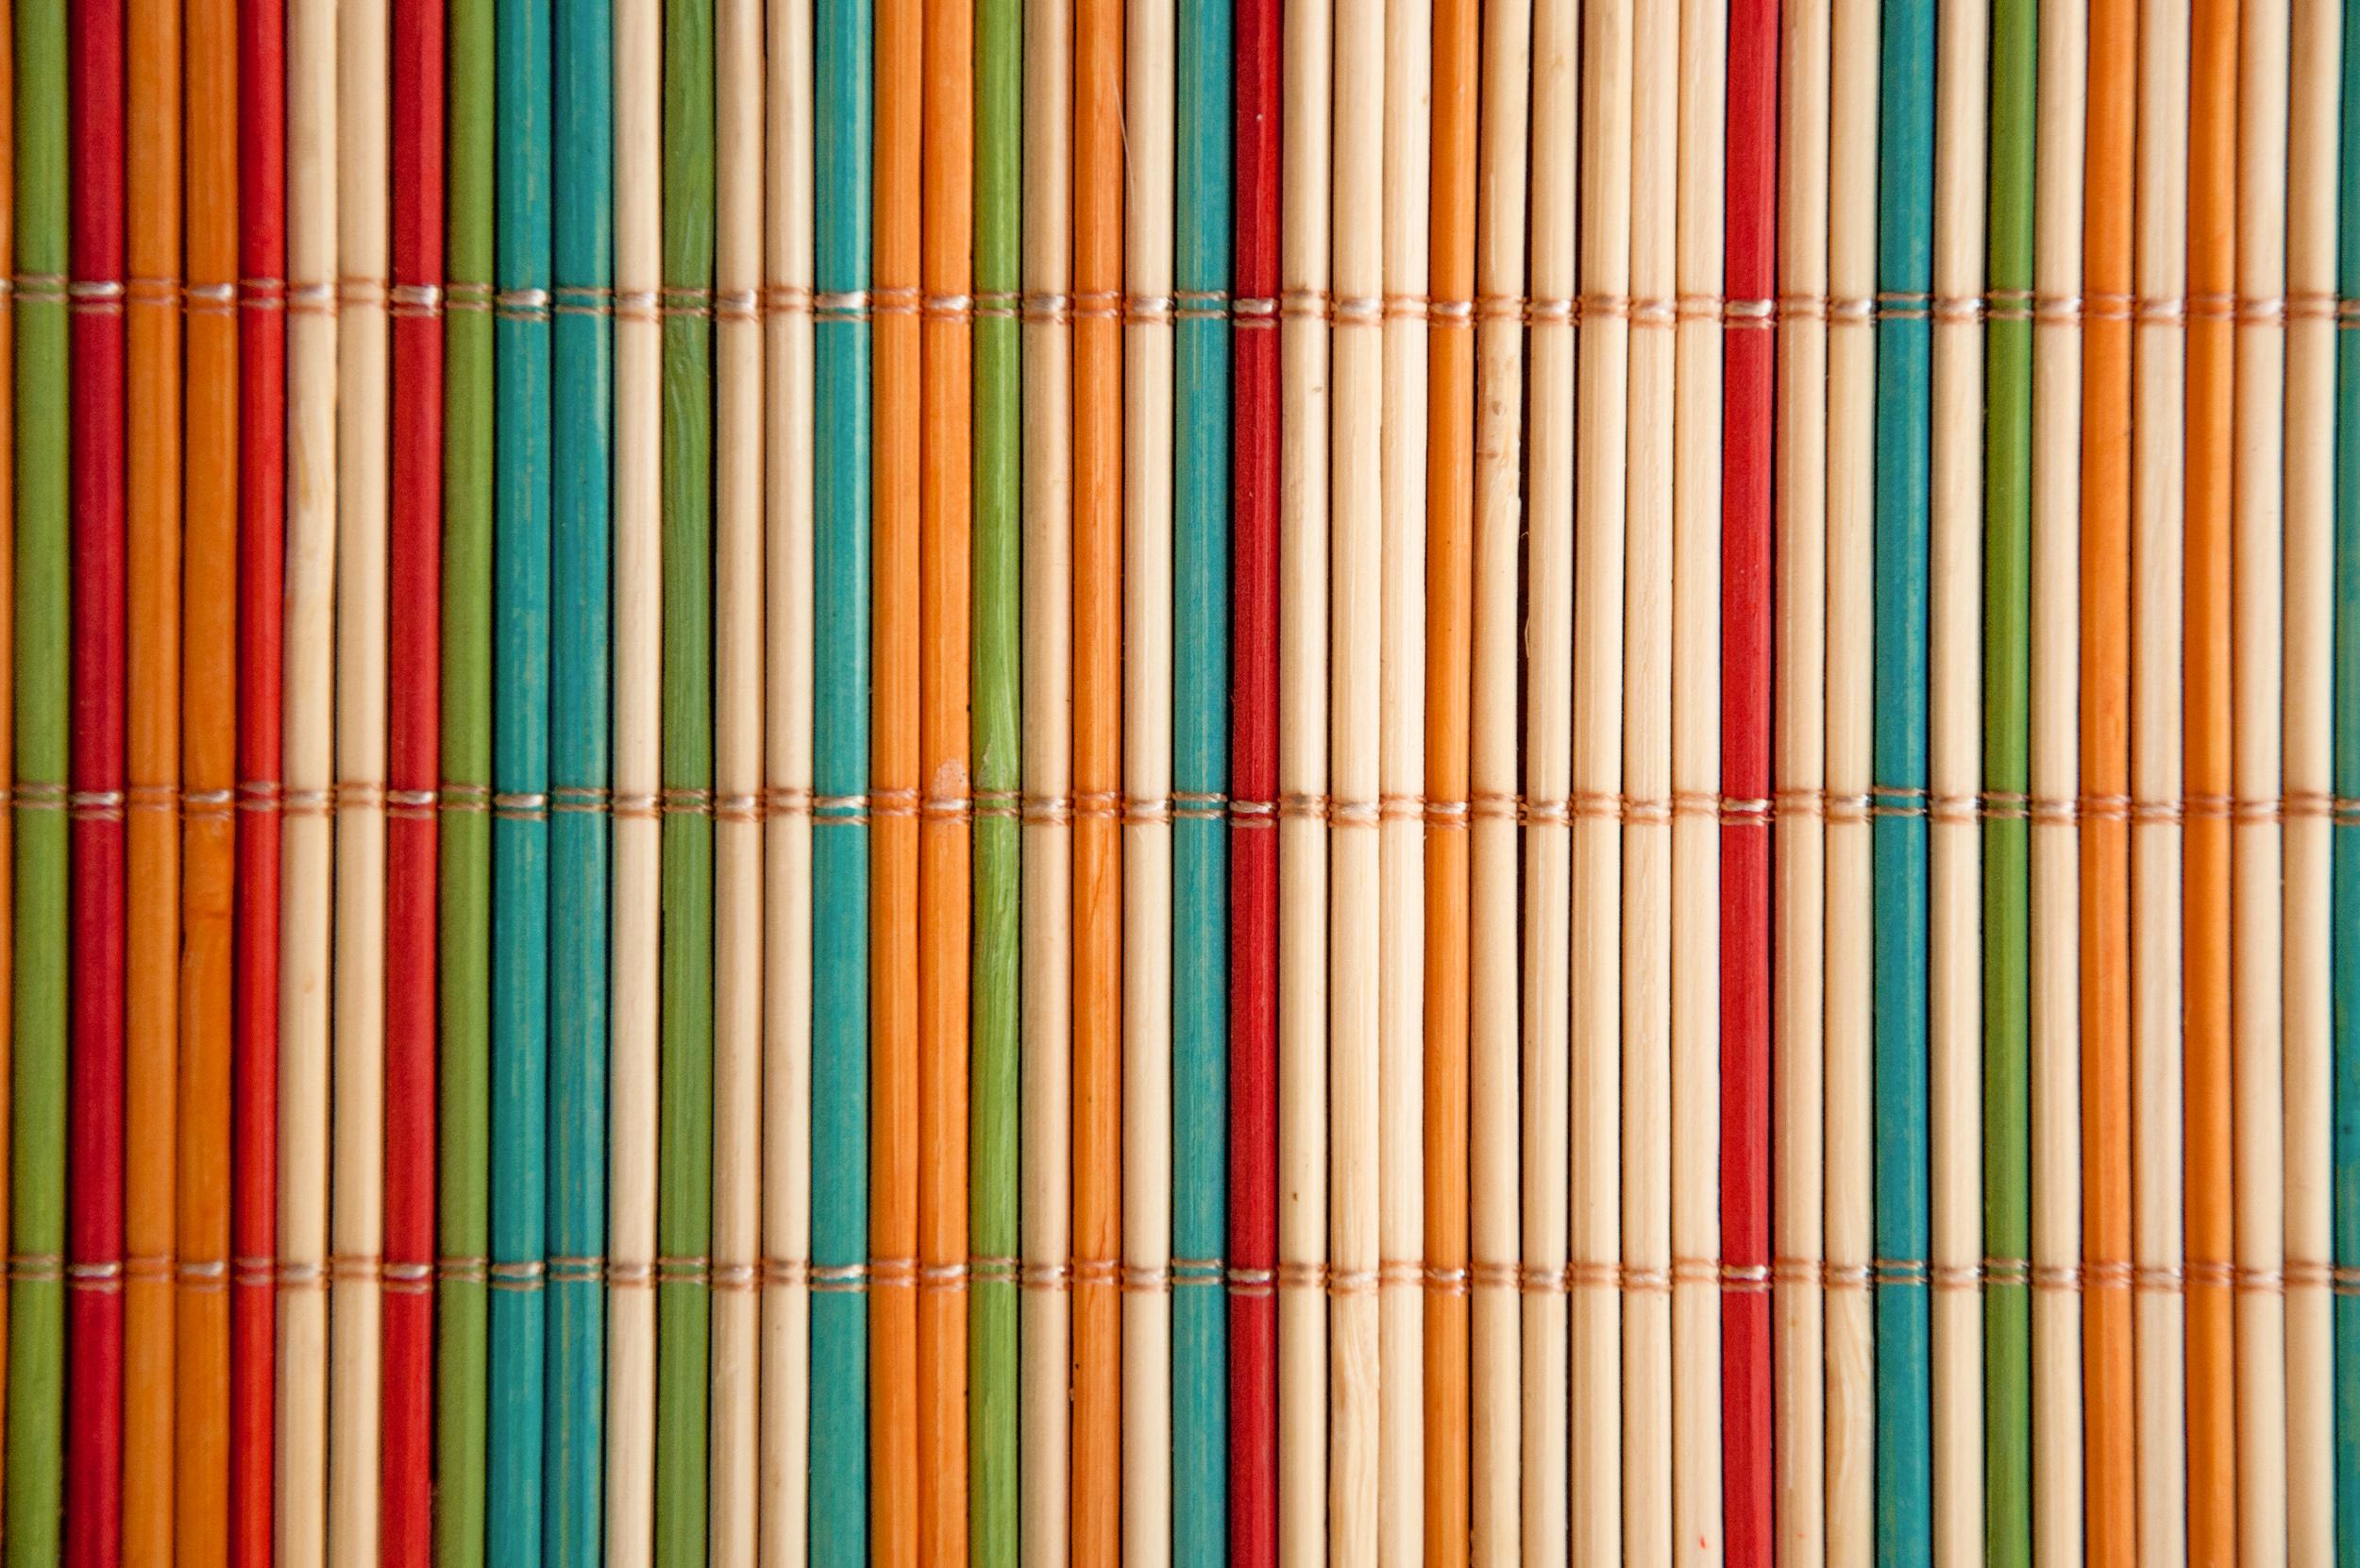 Coloured bamboo mat, Abstract, Rug, Mesh, Napkin, HQ Photo